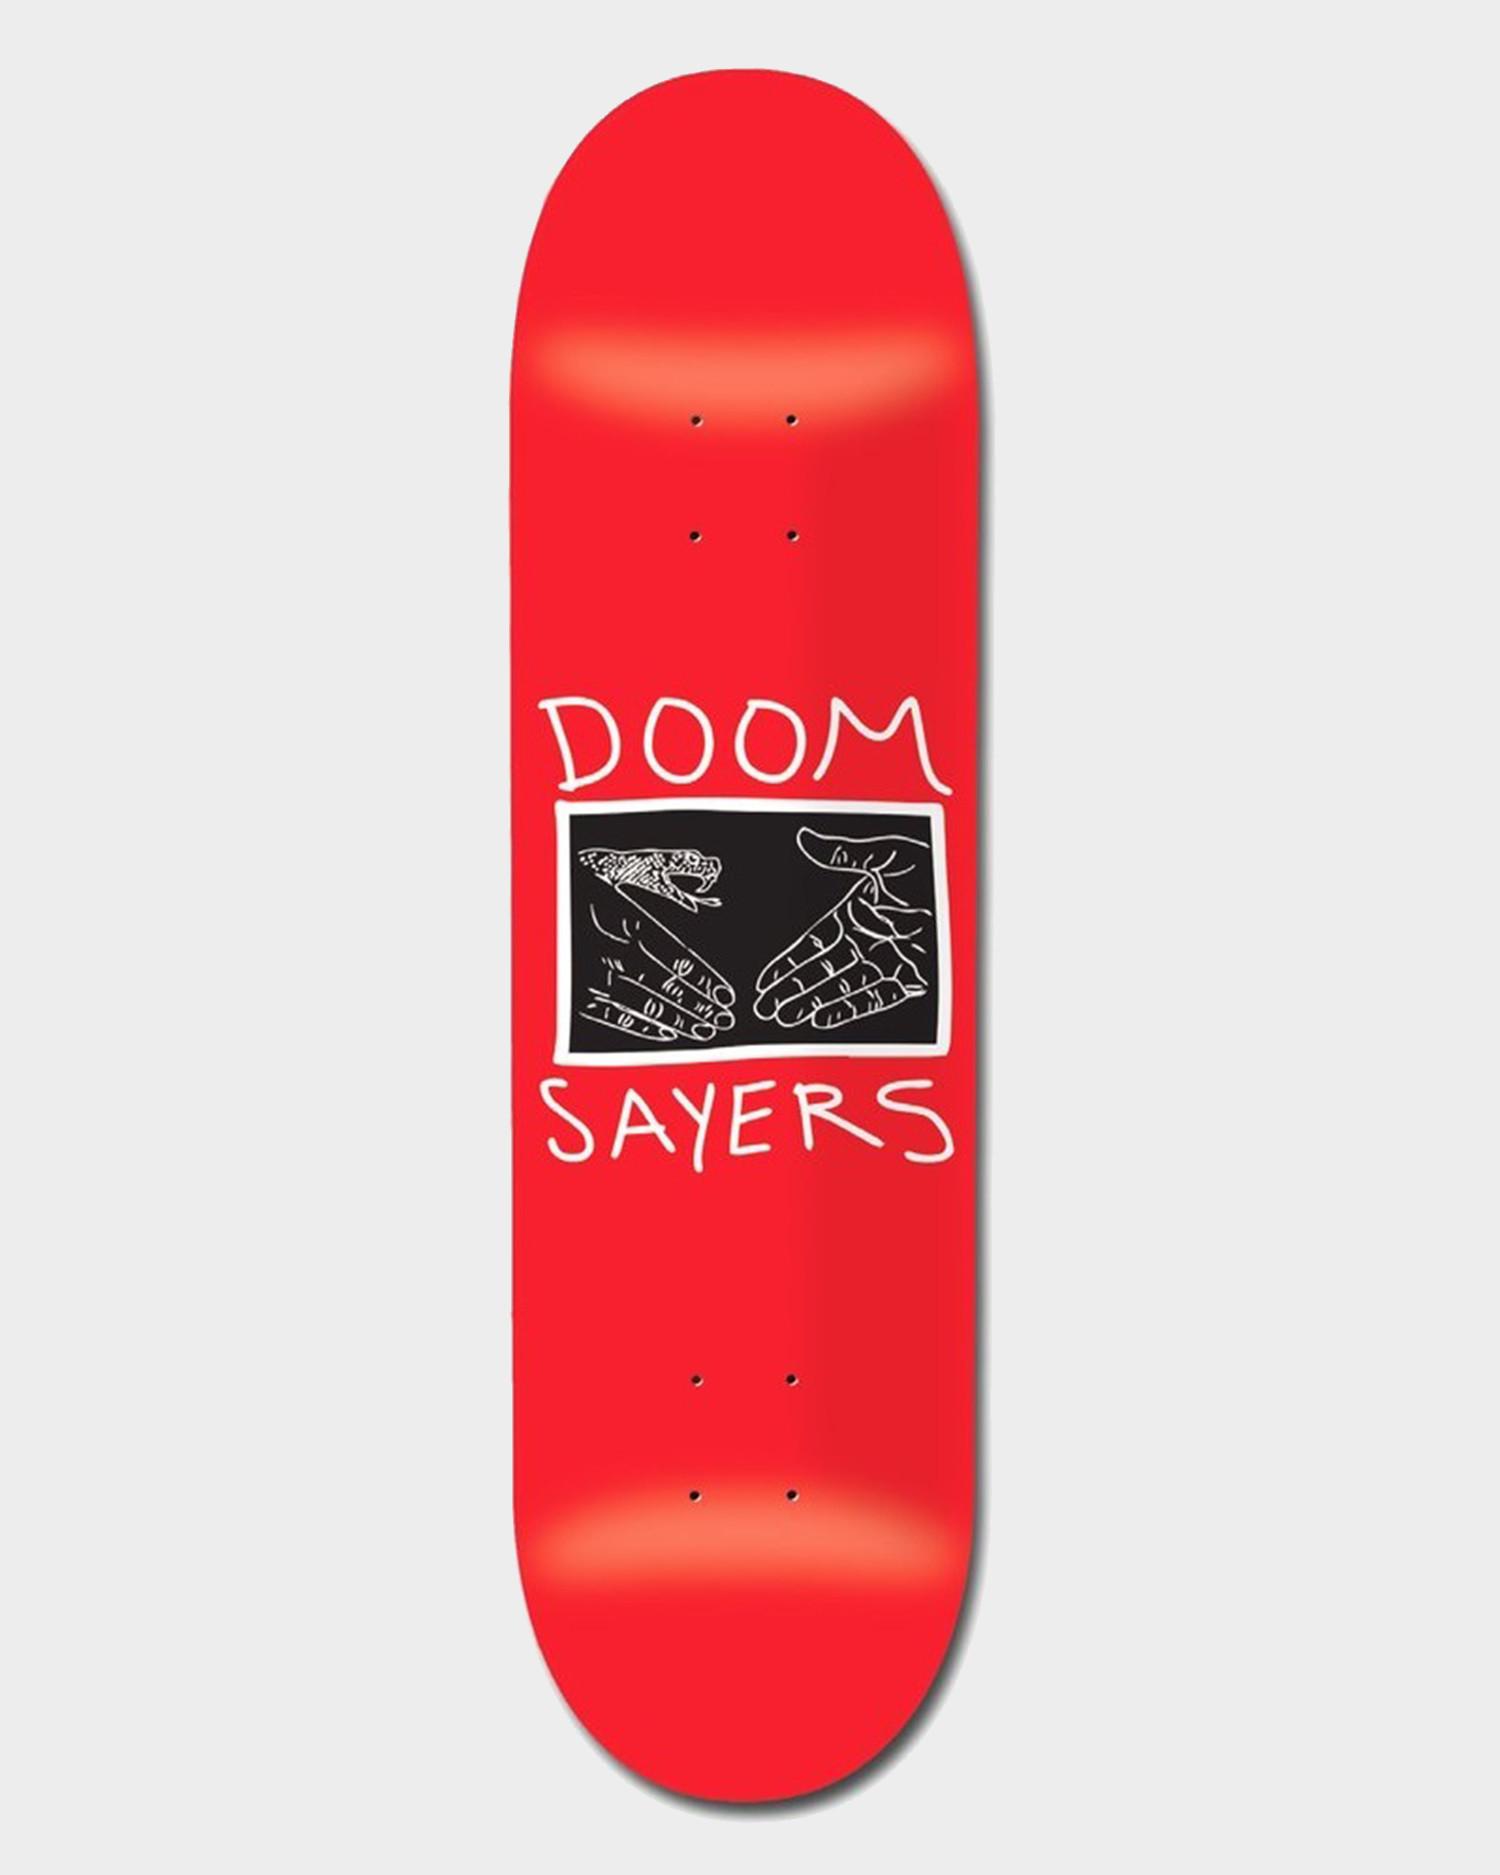 Doomsayers Deck Snake Shake Red 9